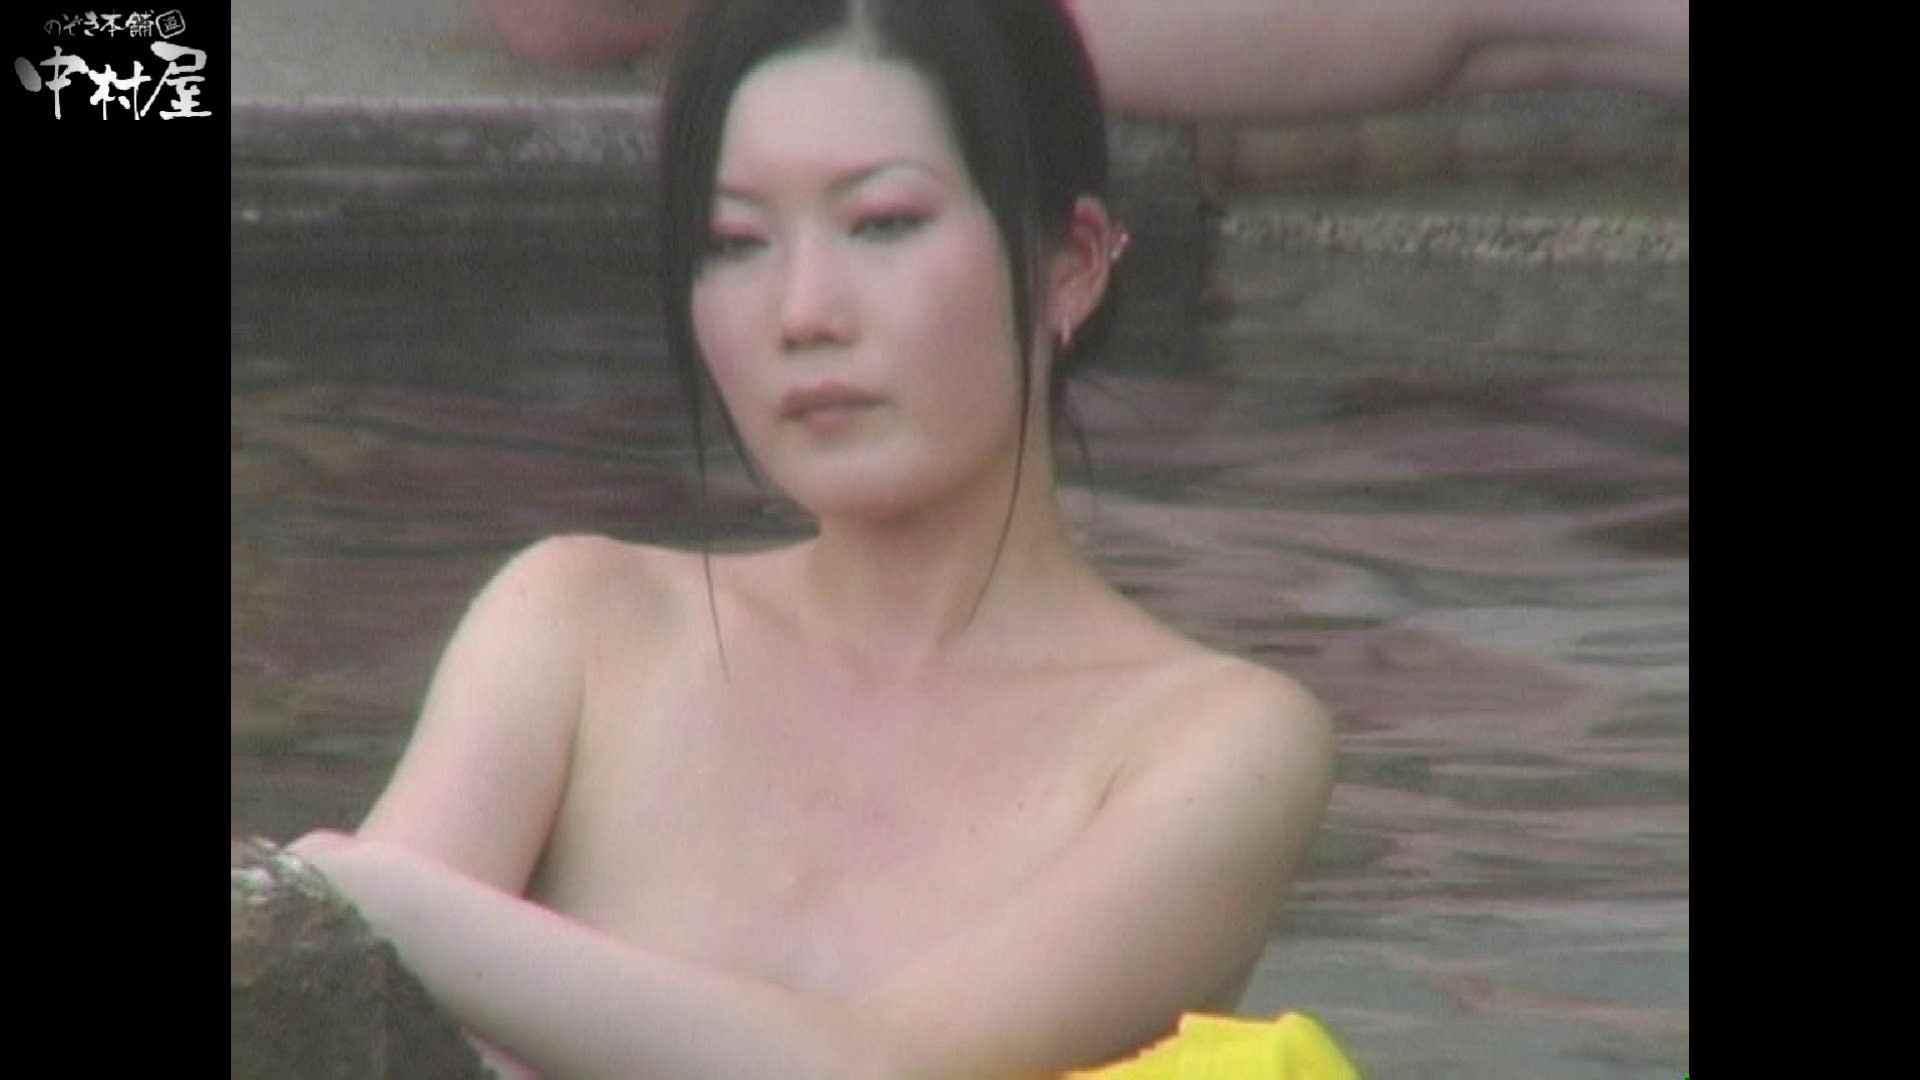 Aquaな露天風呂Vol.940 OLセックス  98画像 75